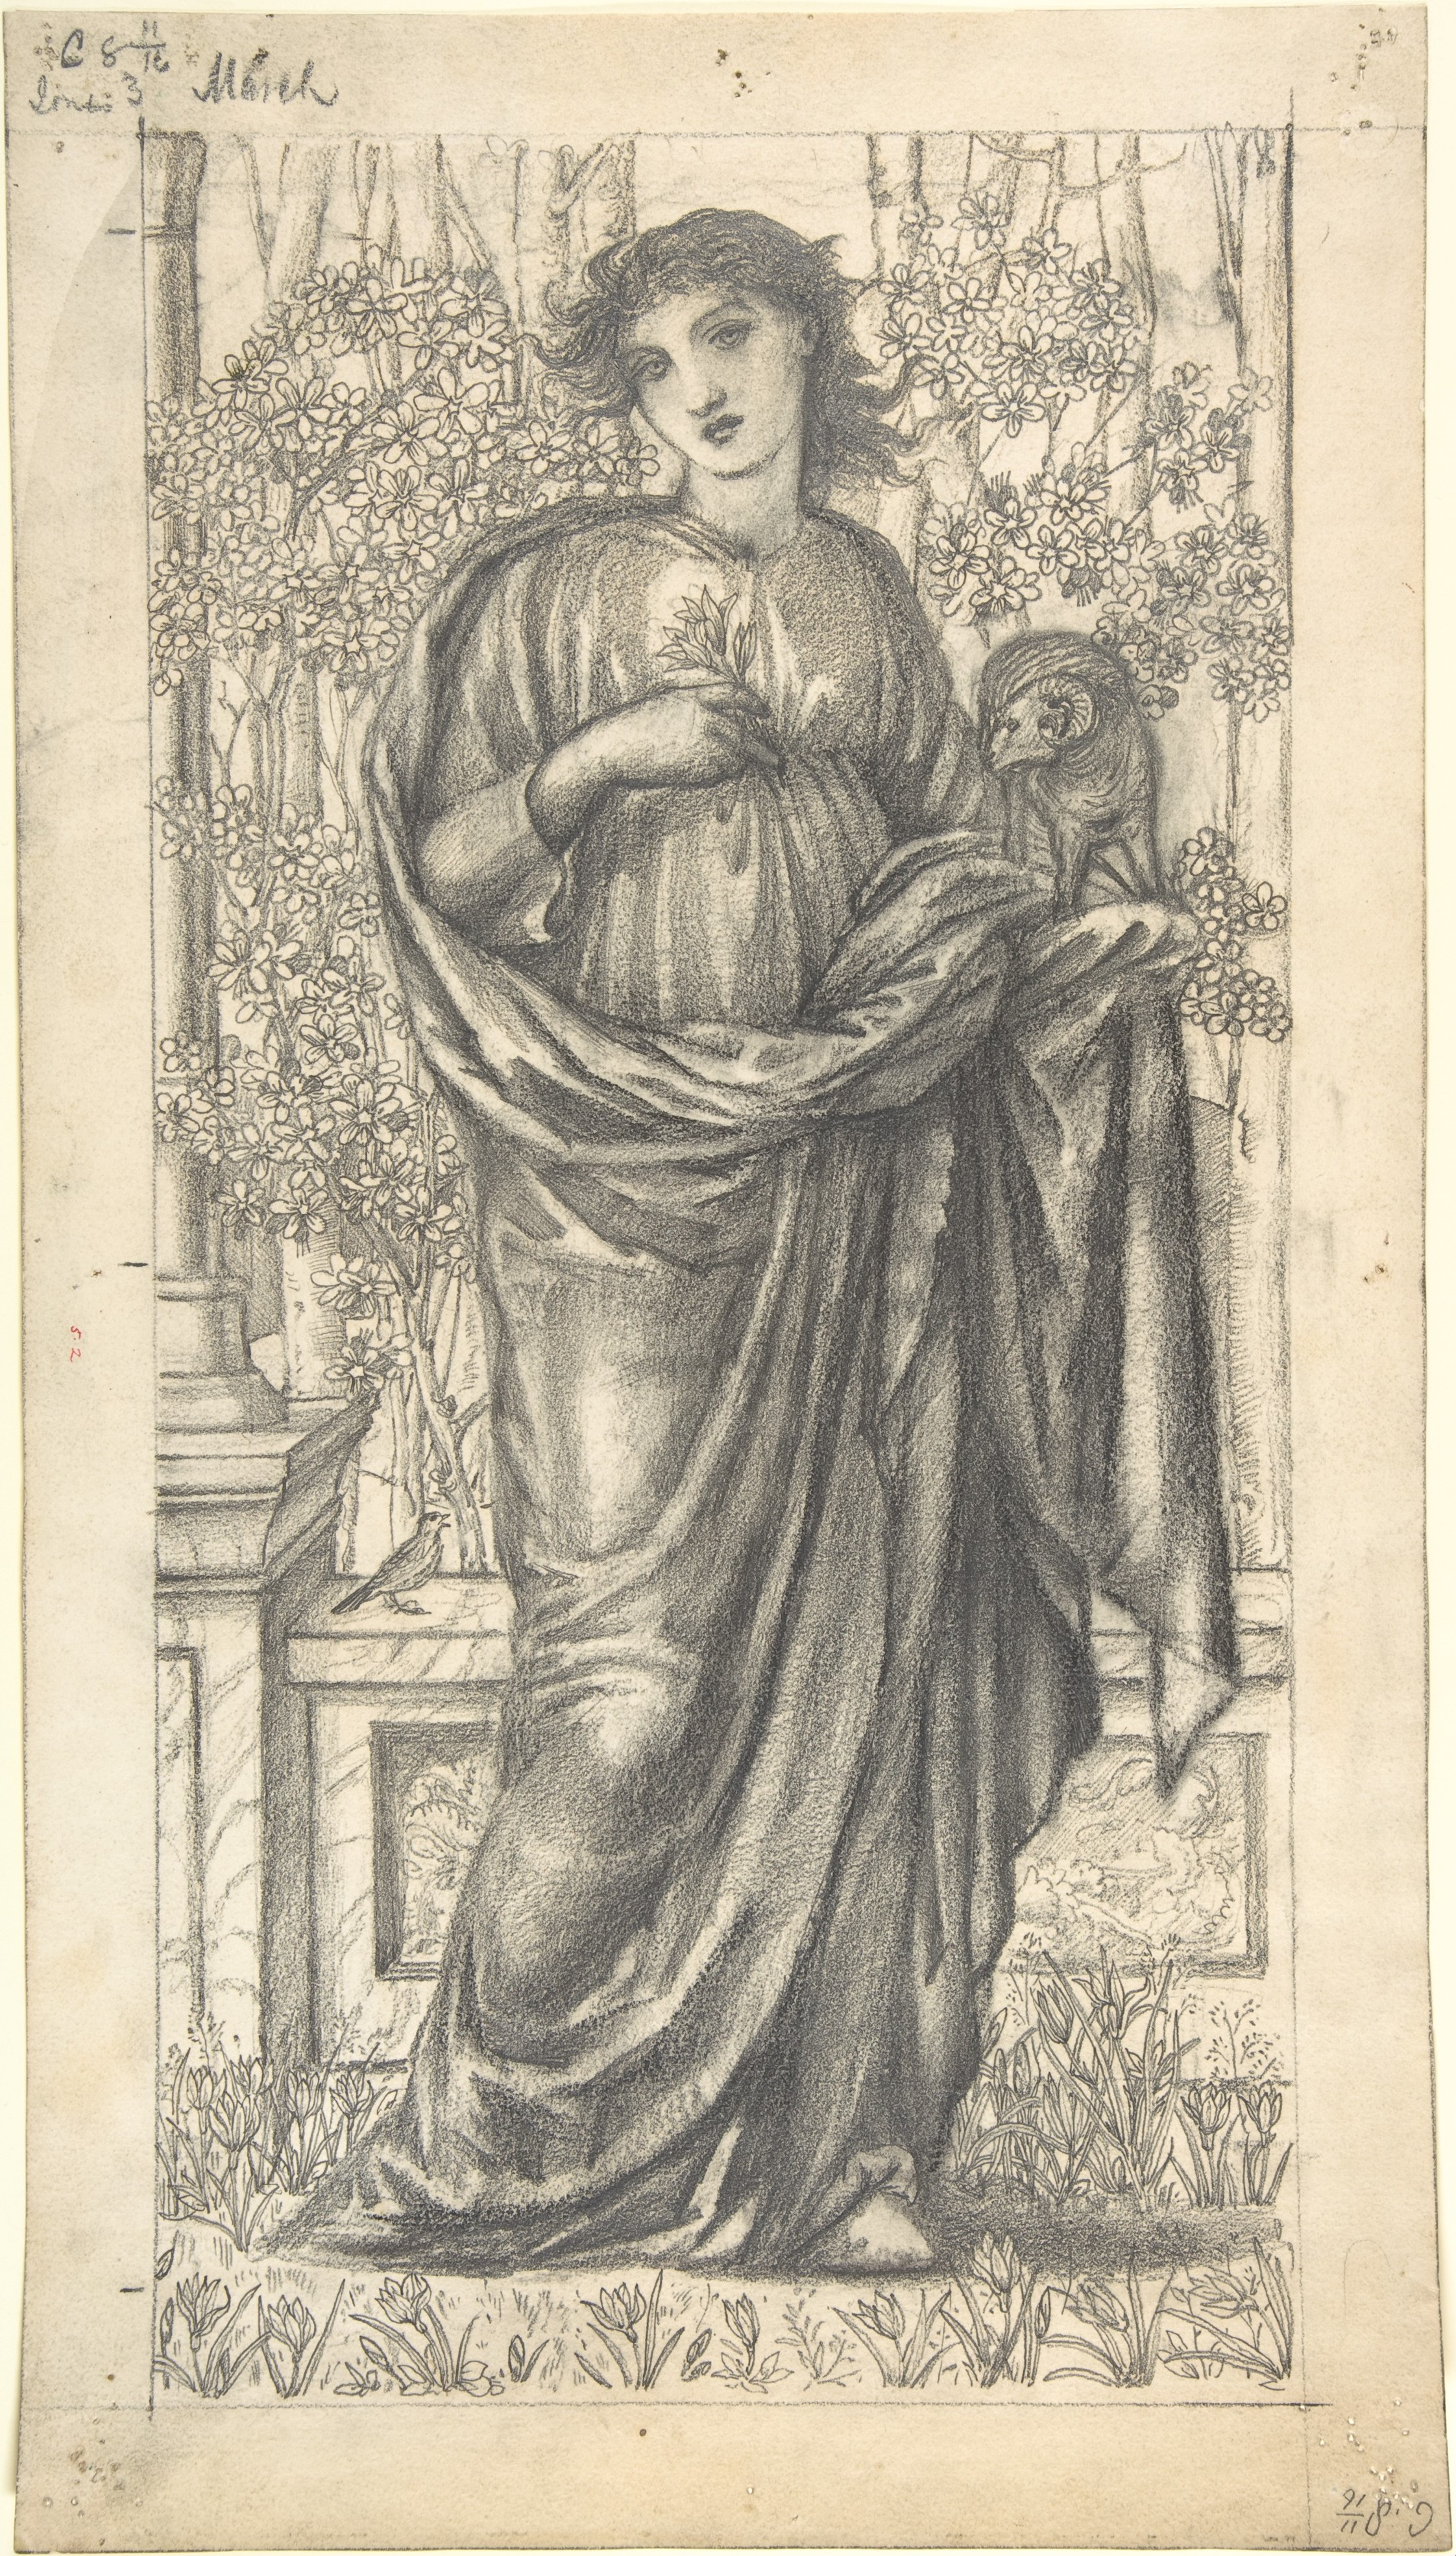 The Month of March ca. 1866 Sir Edward Burne-Jones